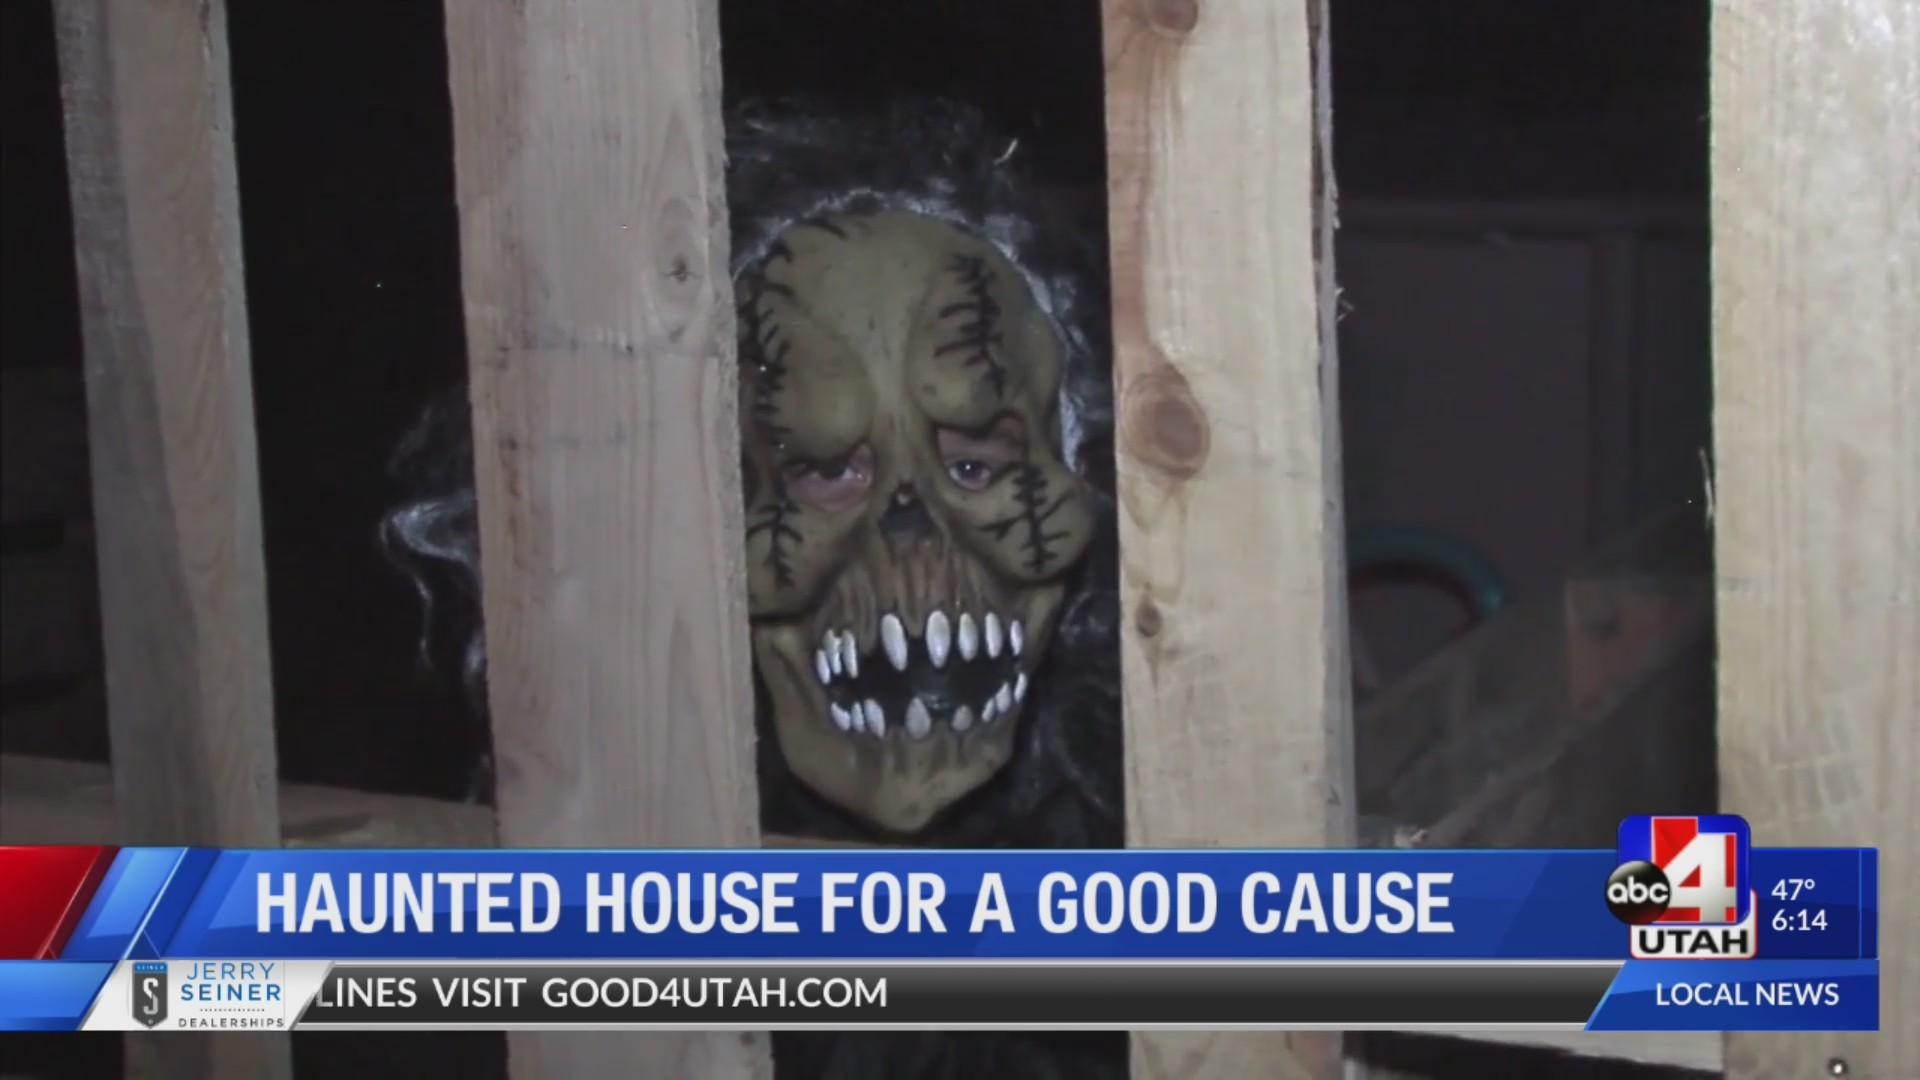 Southern_Utah_man_creates_haunted_house__0_20181101015408